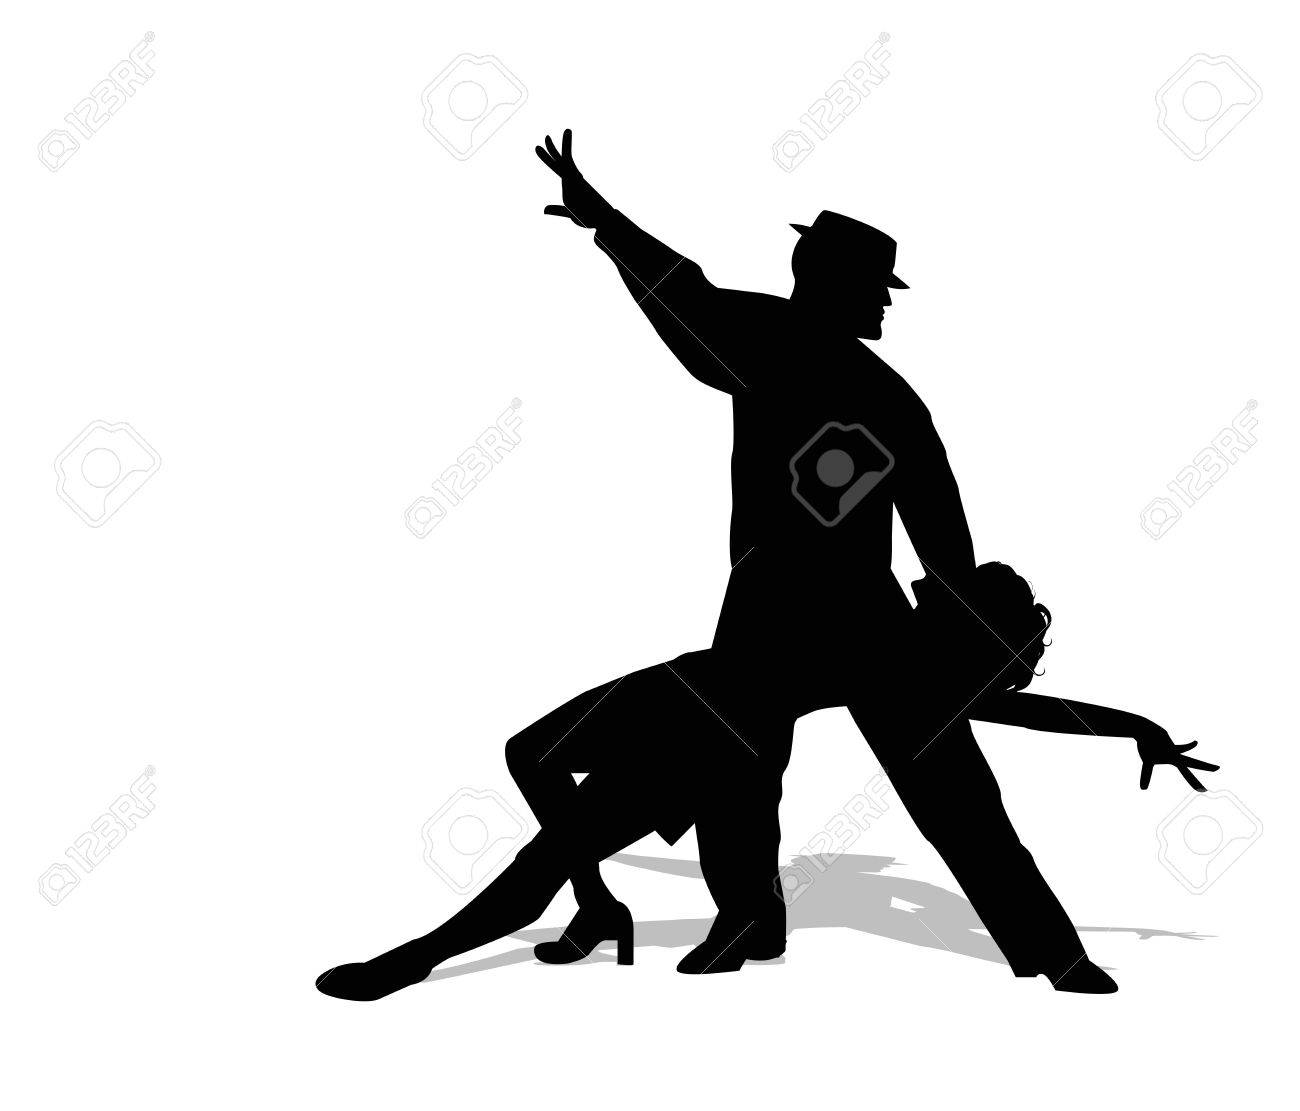 dancers silhouette - 50146295